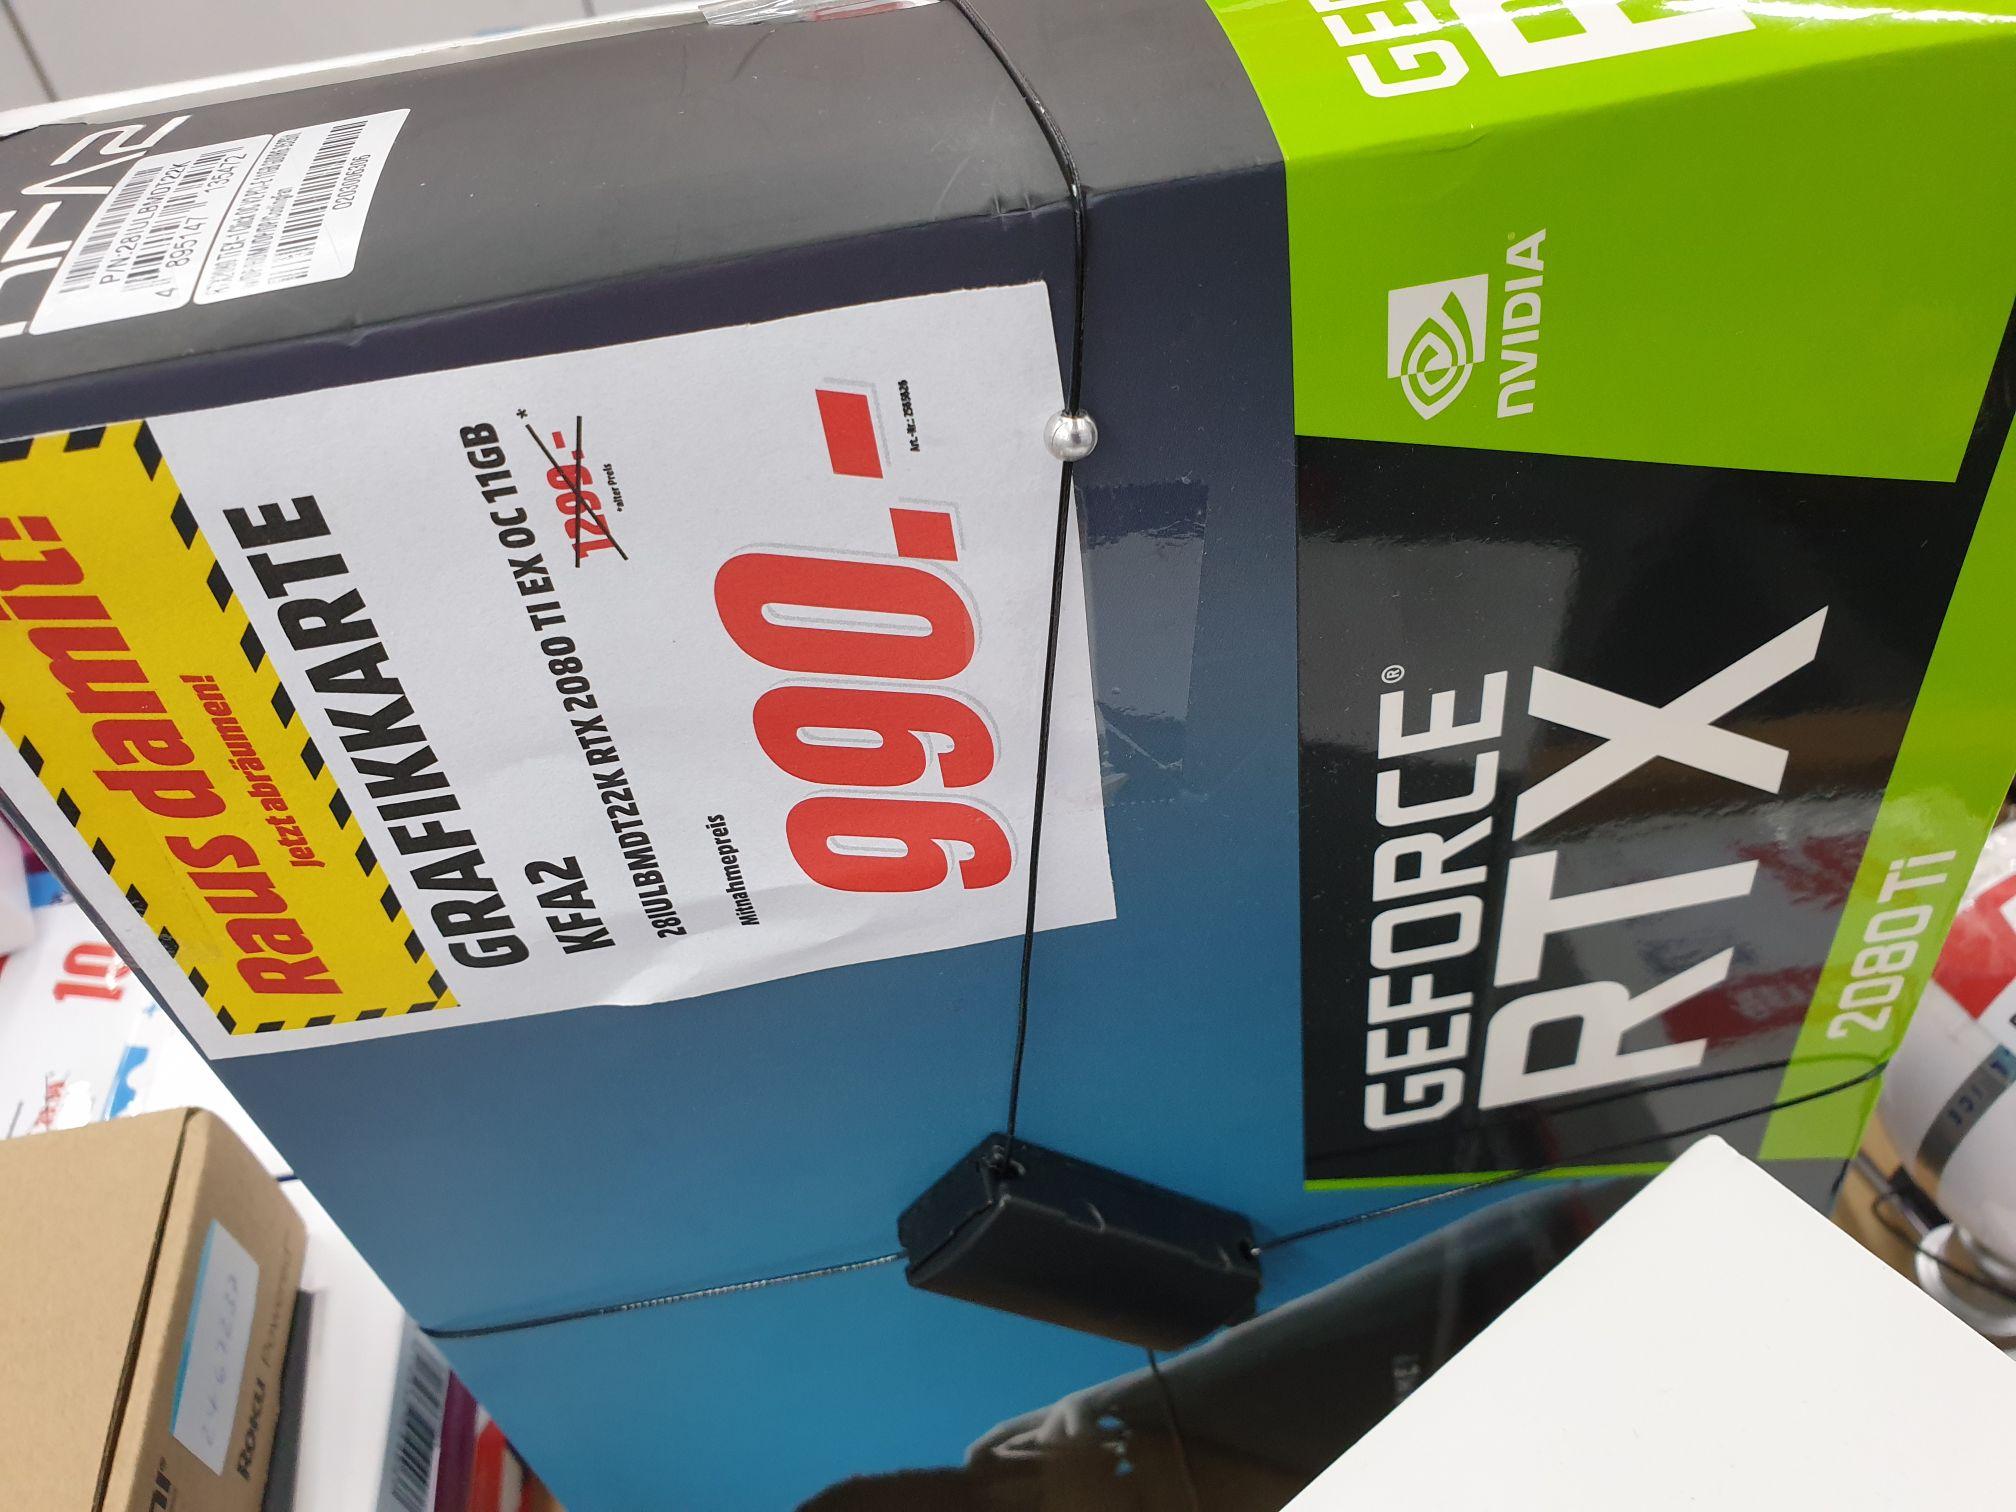 Lokal Media Markt Erding - KFA2 Geforce RTX 2080 Ti 11GB EX OC Einzelstück